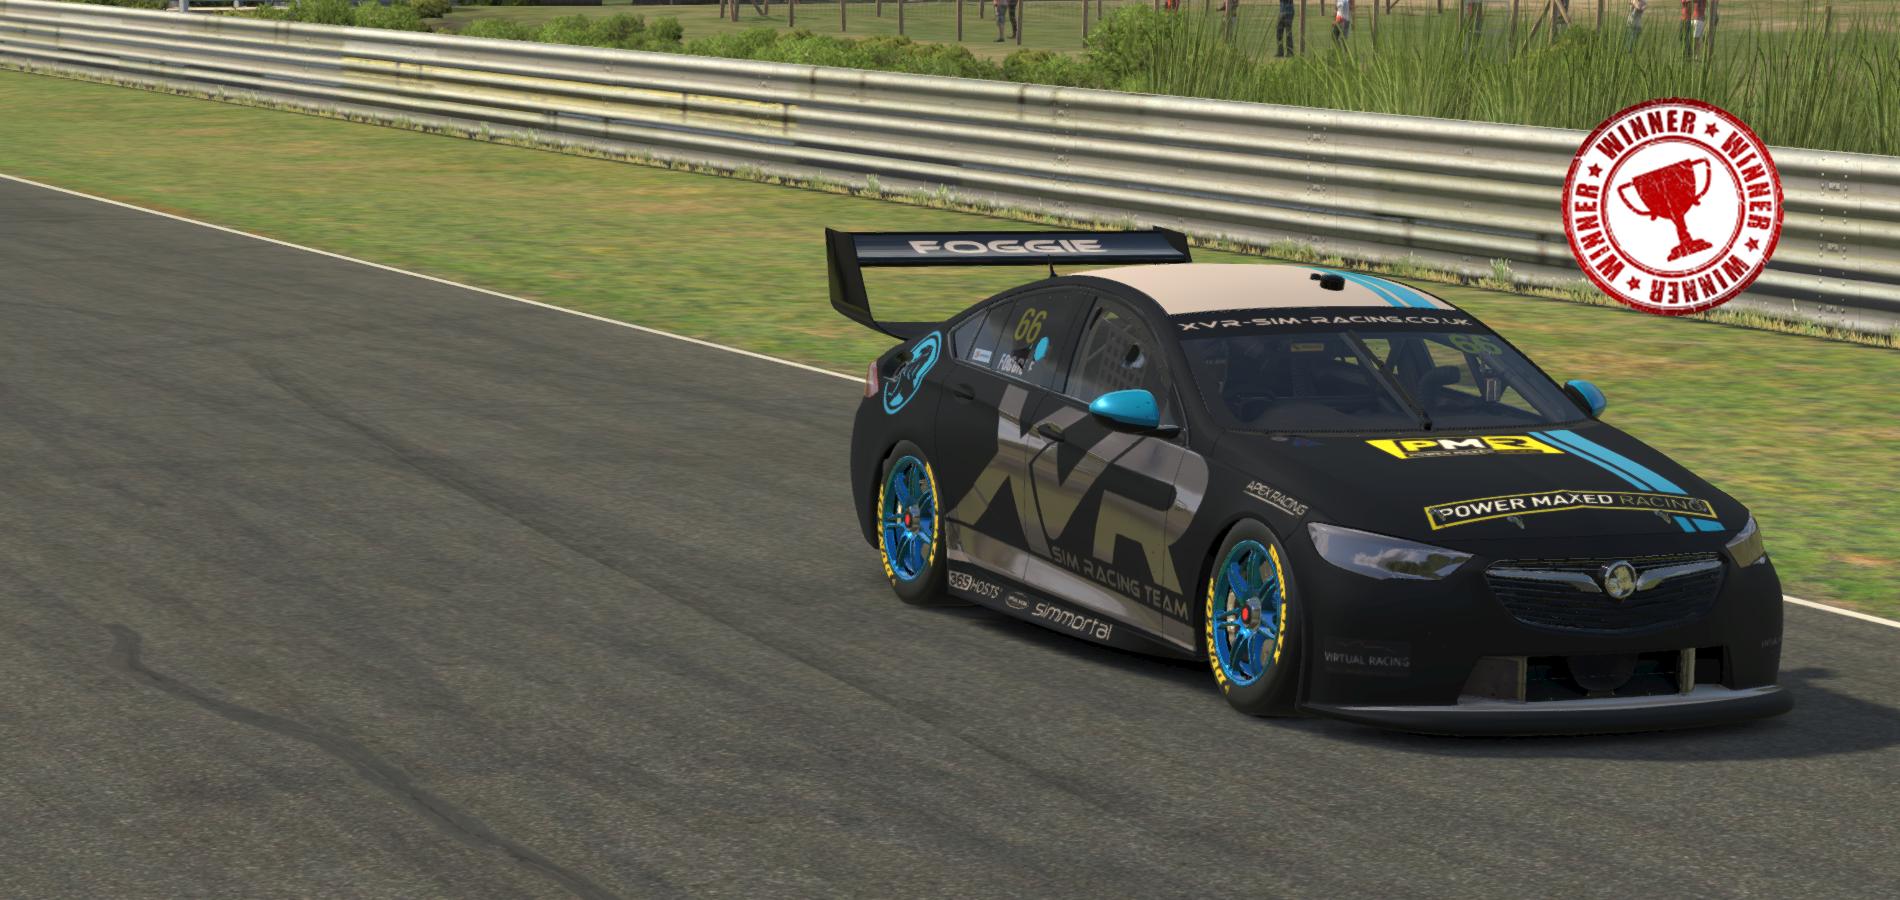 Nicol Foggie wins the V8ESC Season 8 Drivers Championship